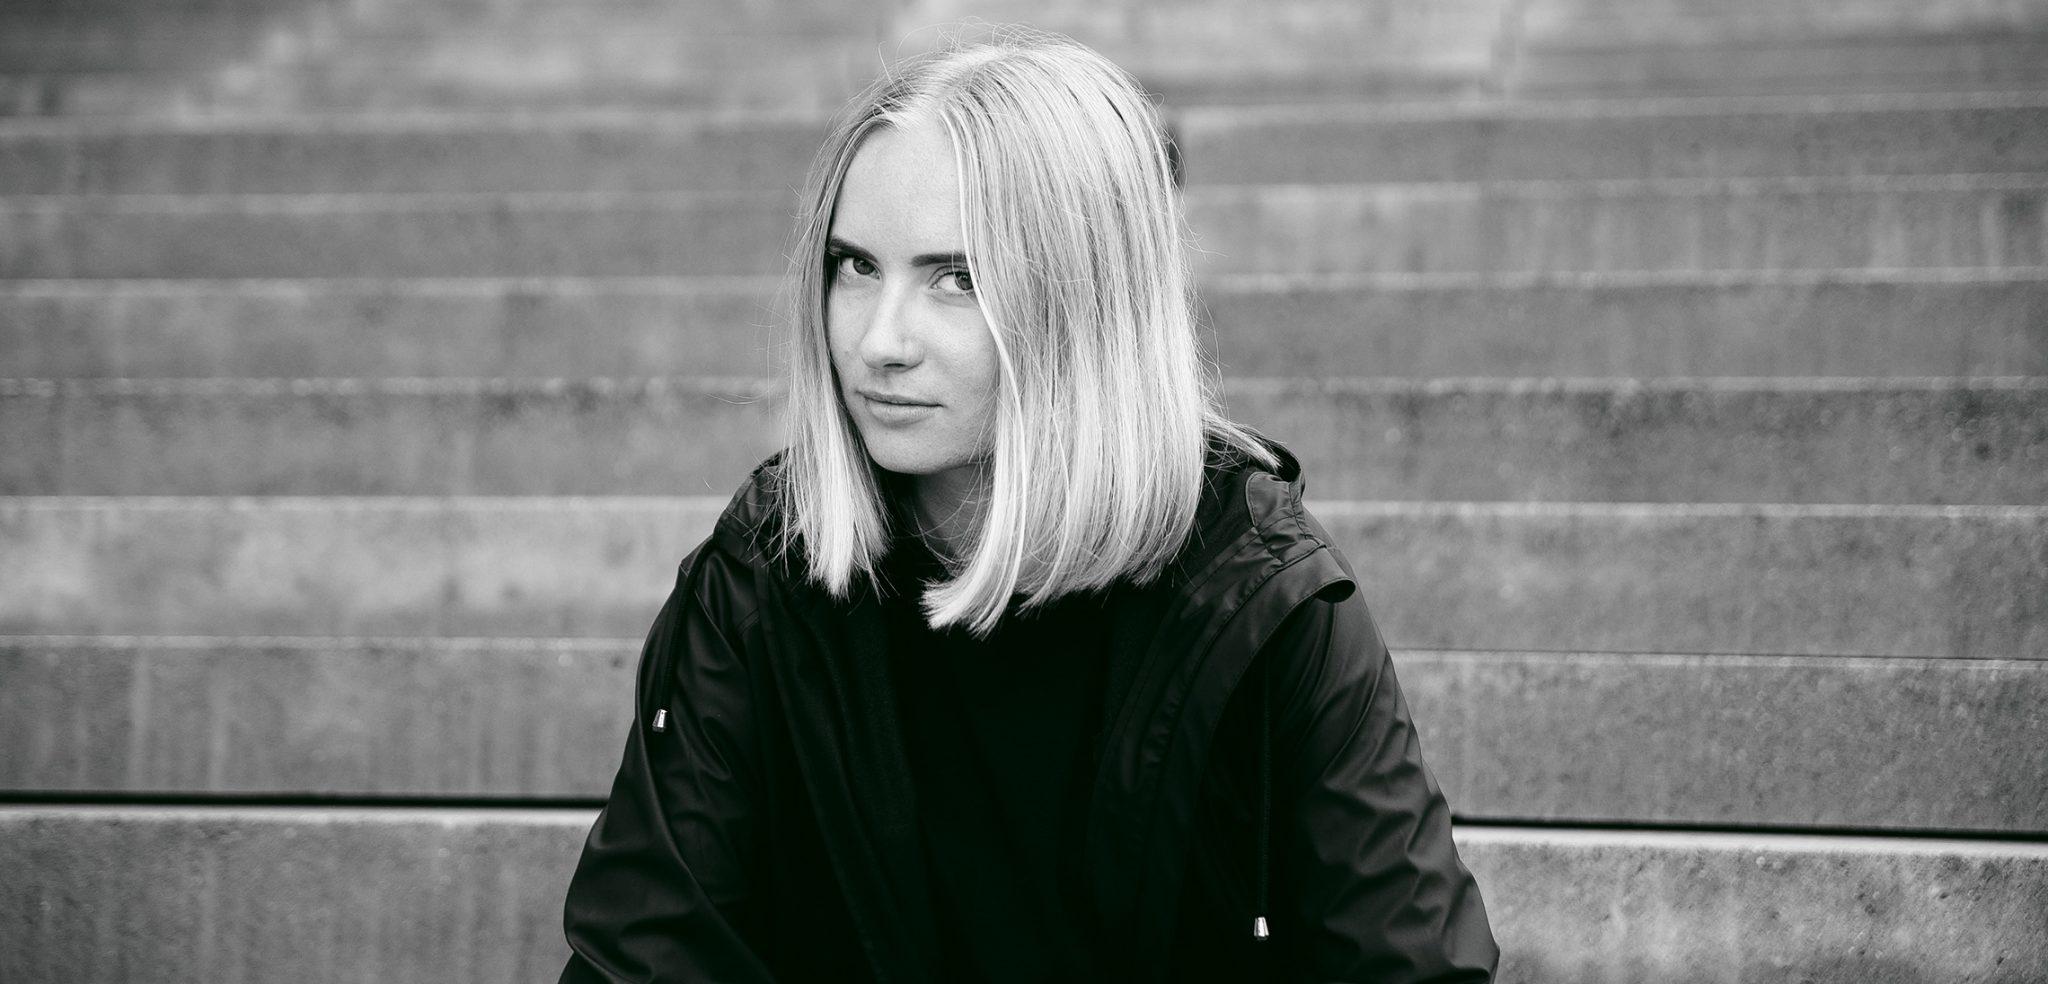 Yulia Niko - Paradise EP hero